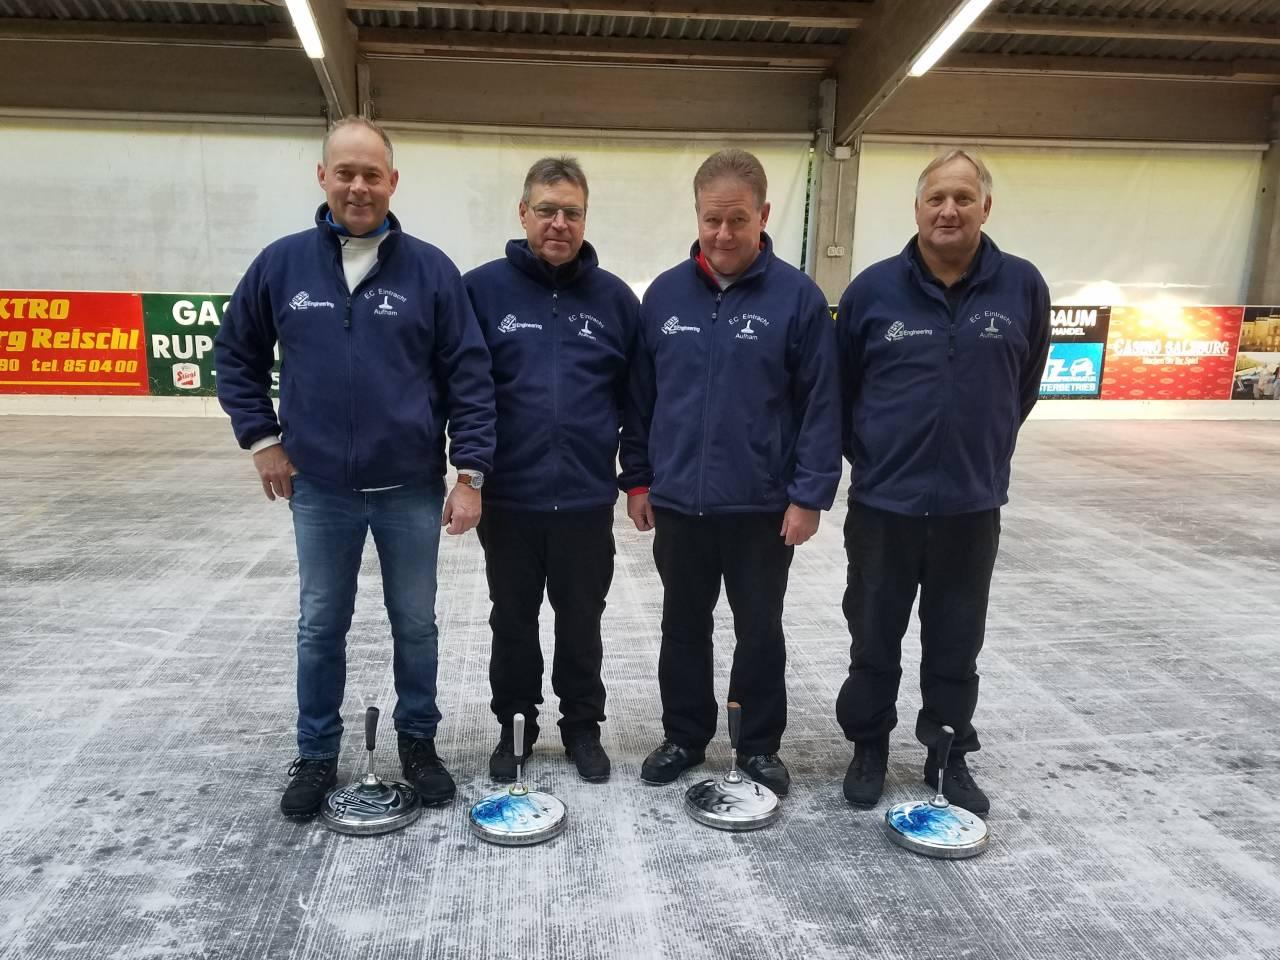 v.l. Stefan Heigenhauser, Heinz Lexhaller, Ludwig Hogger und Harry Pirker